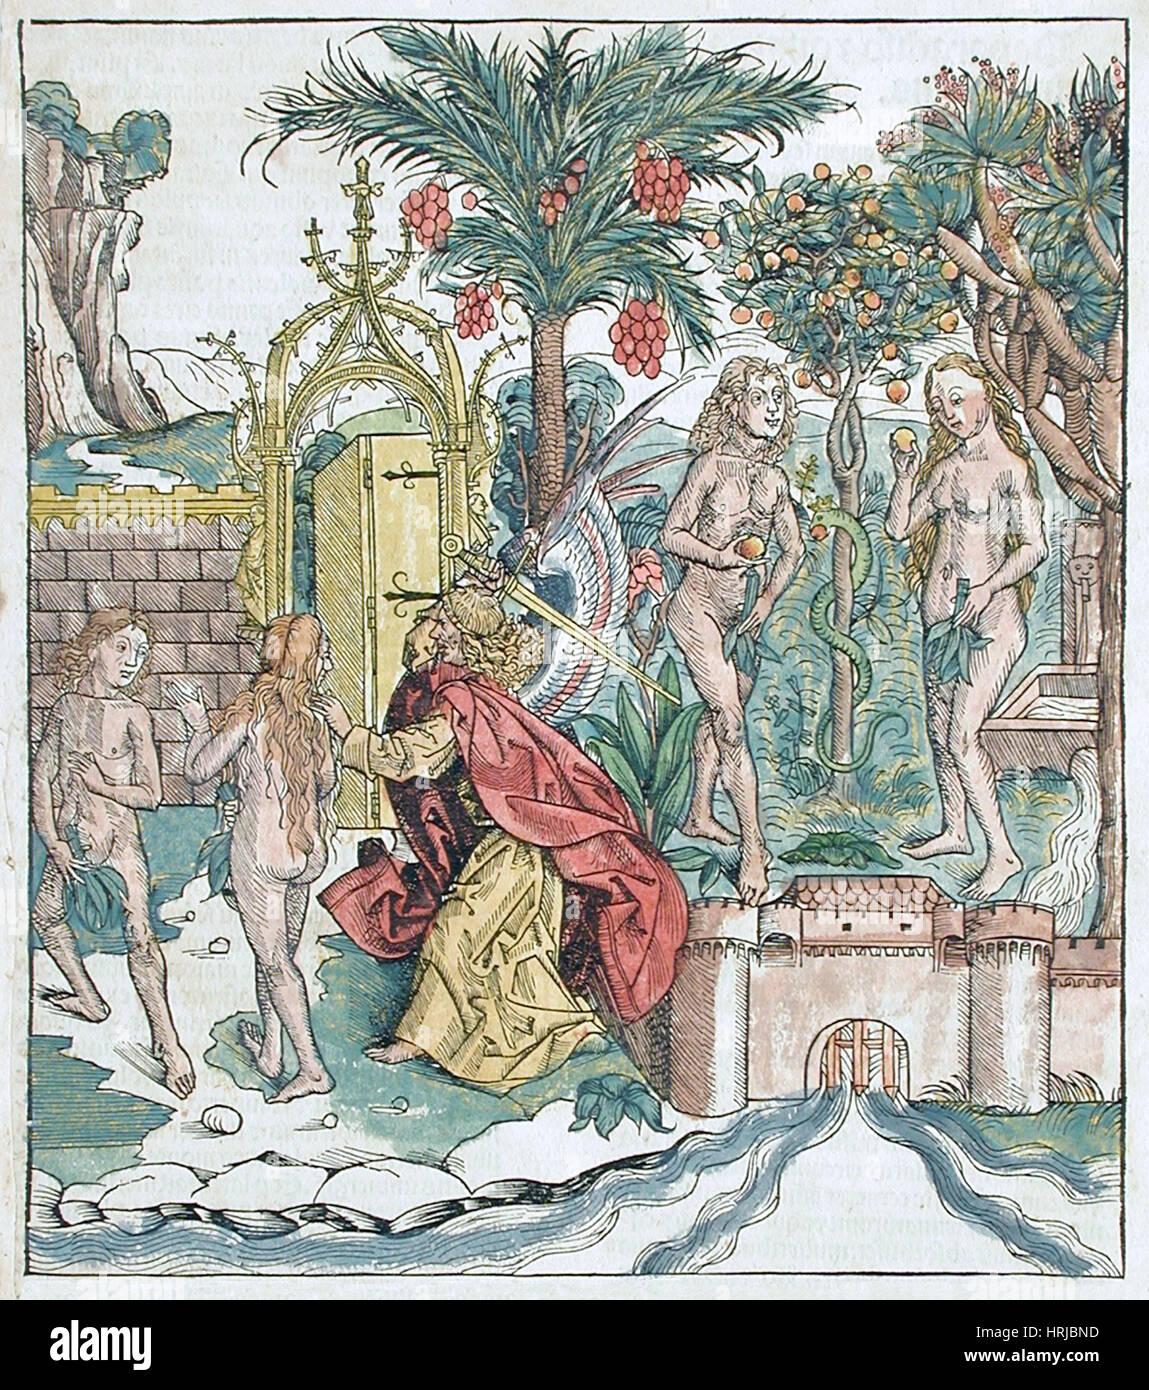 Garden of Eden, Expulsion of Adam and Eve, 1493 Stock Photo